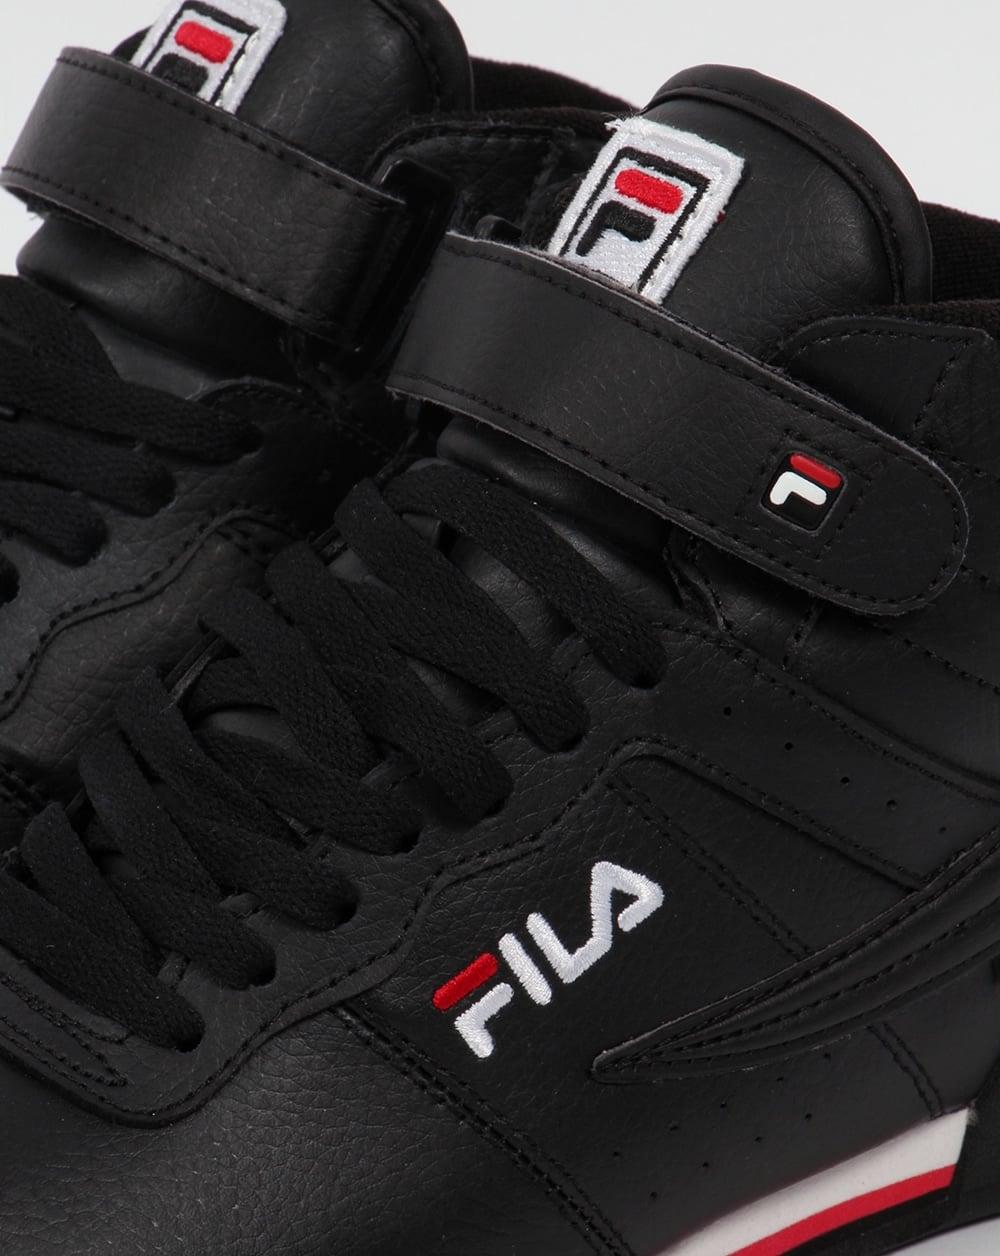 d012c3e069 Fila Vintage F-13 Trainers Black,high tops,shoes,basketball